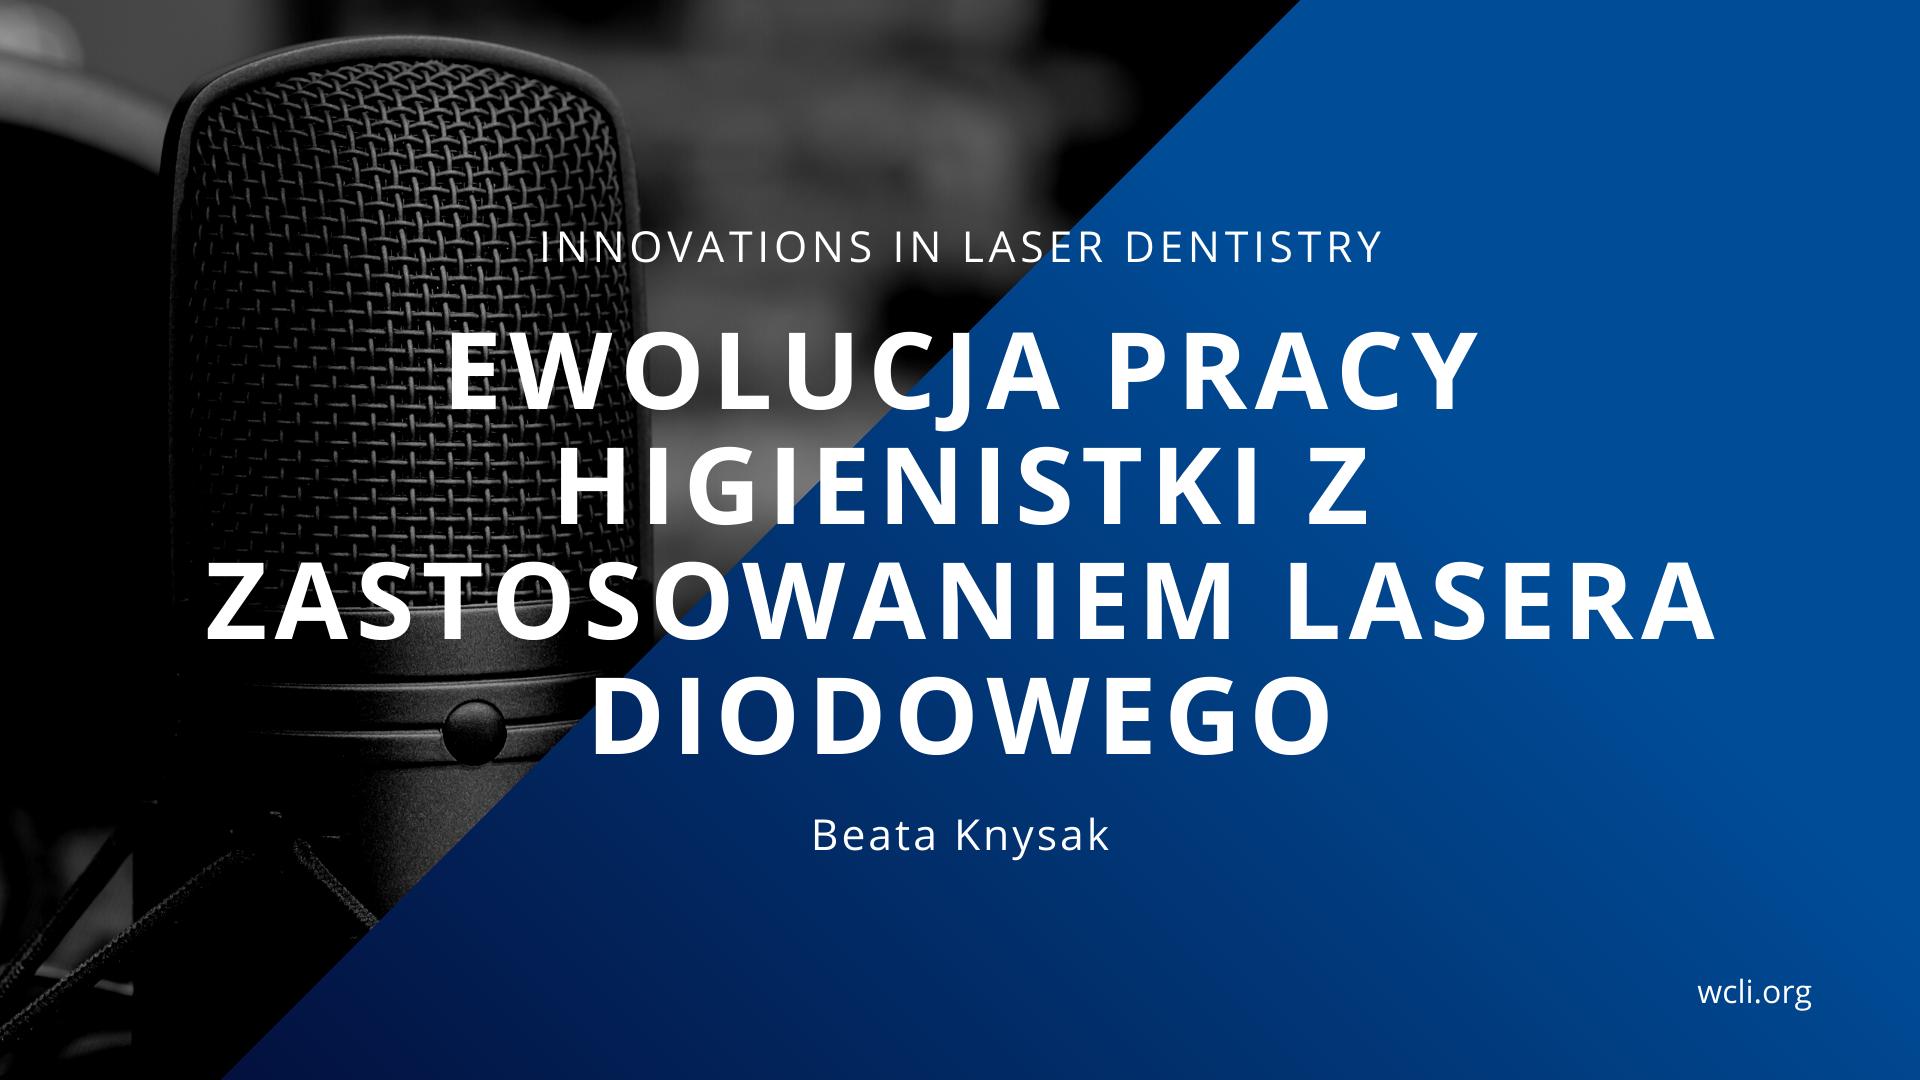 webinar-cover-Beata Knysak